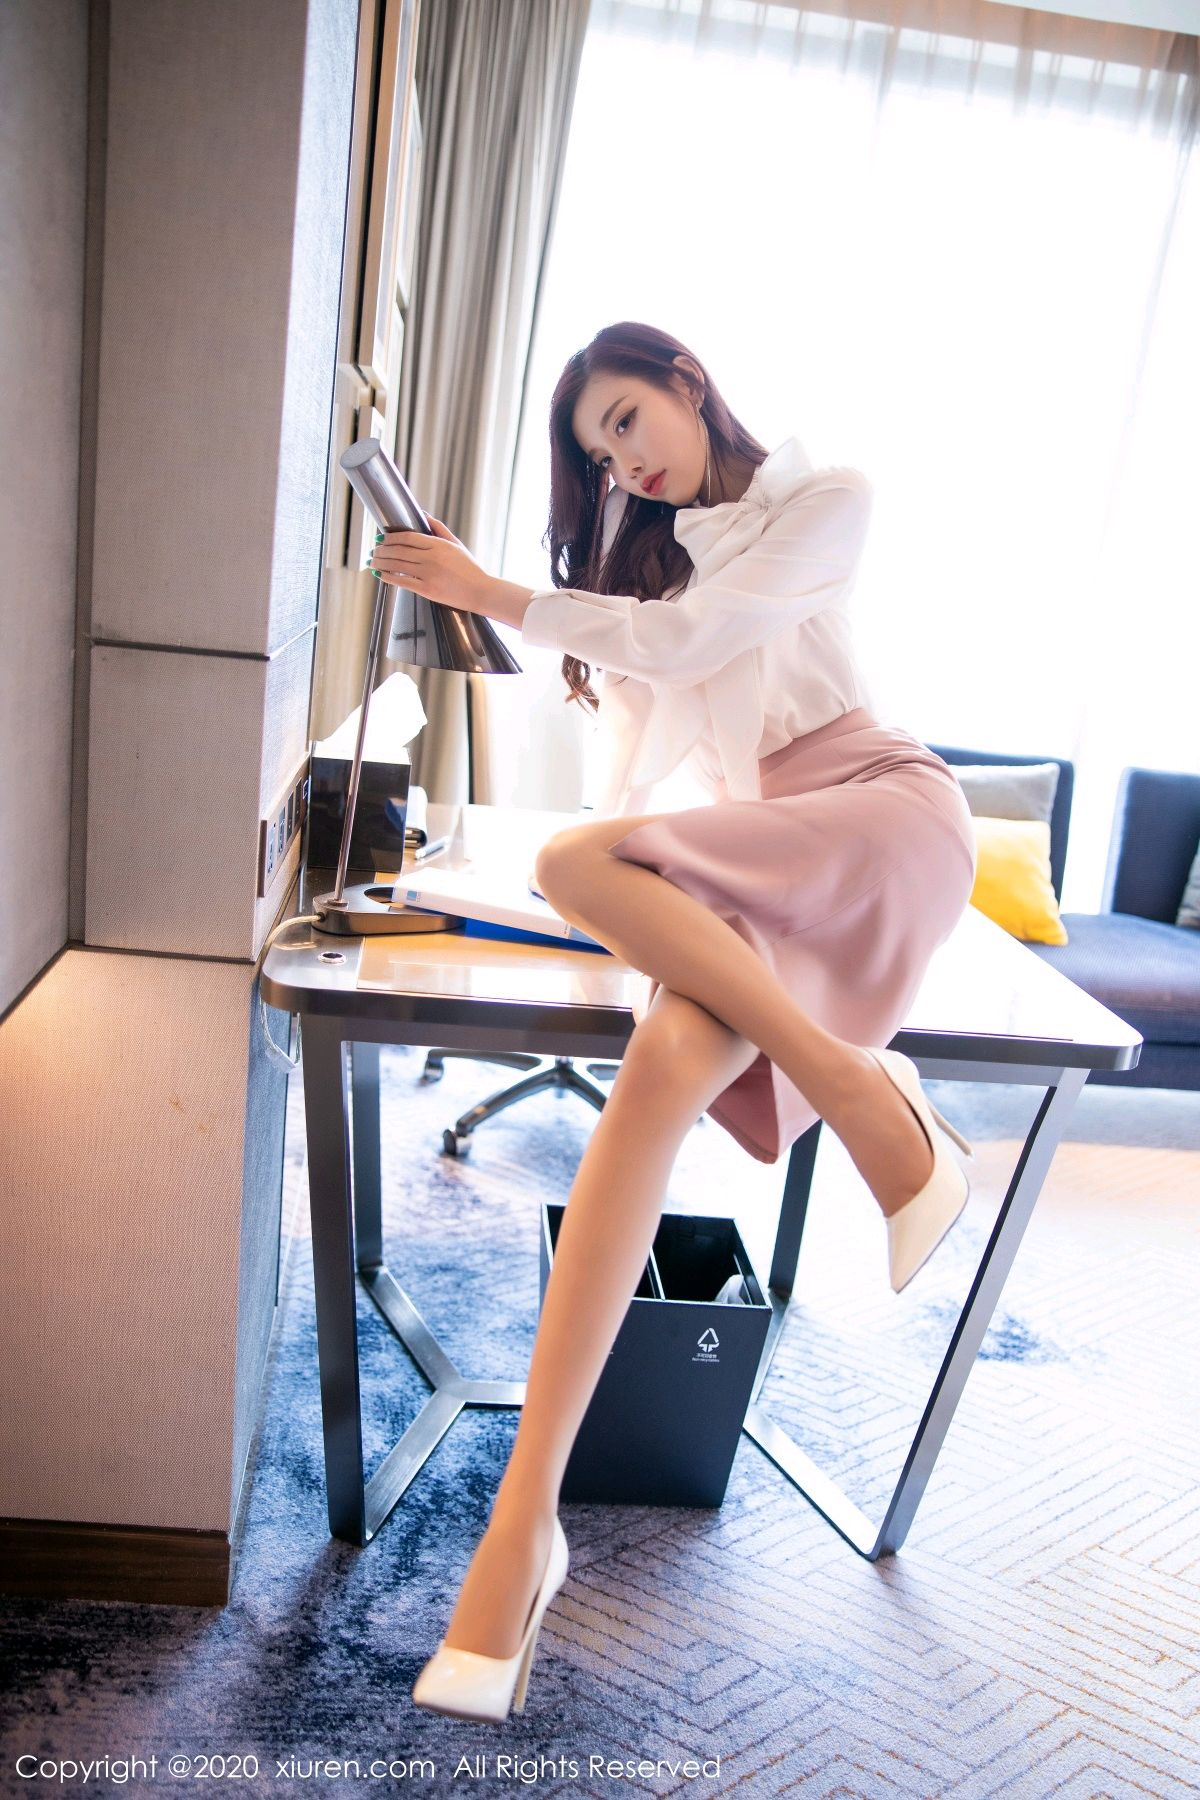 [XiuRen] Vol.2431 Yang Chen Chen 20P, Tall, Underwear, Uniform, Xiuren, Yang Chen Chen